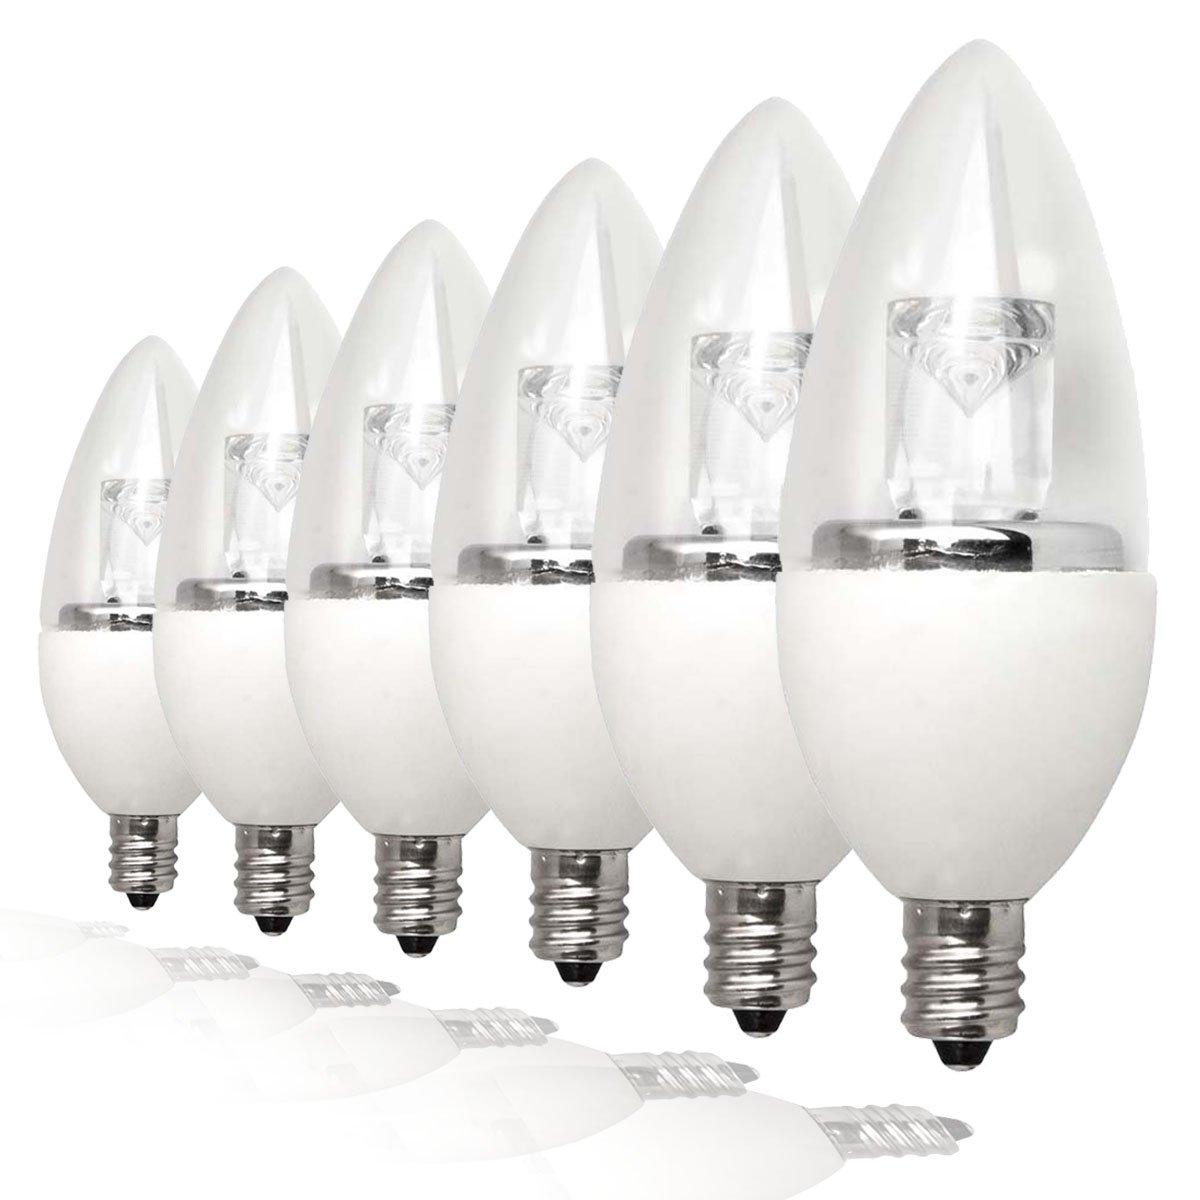 TCP LDCT25W50K6 25 Watt Equivalent LED Decorative Torpedo Light Bulbs, Small Candelabra Based, Energy Star Certified, Dimmable, Daylight (6 Pack)